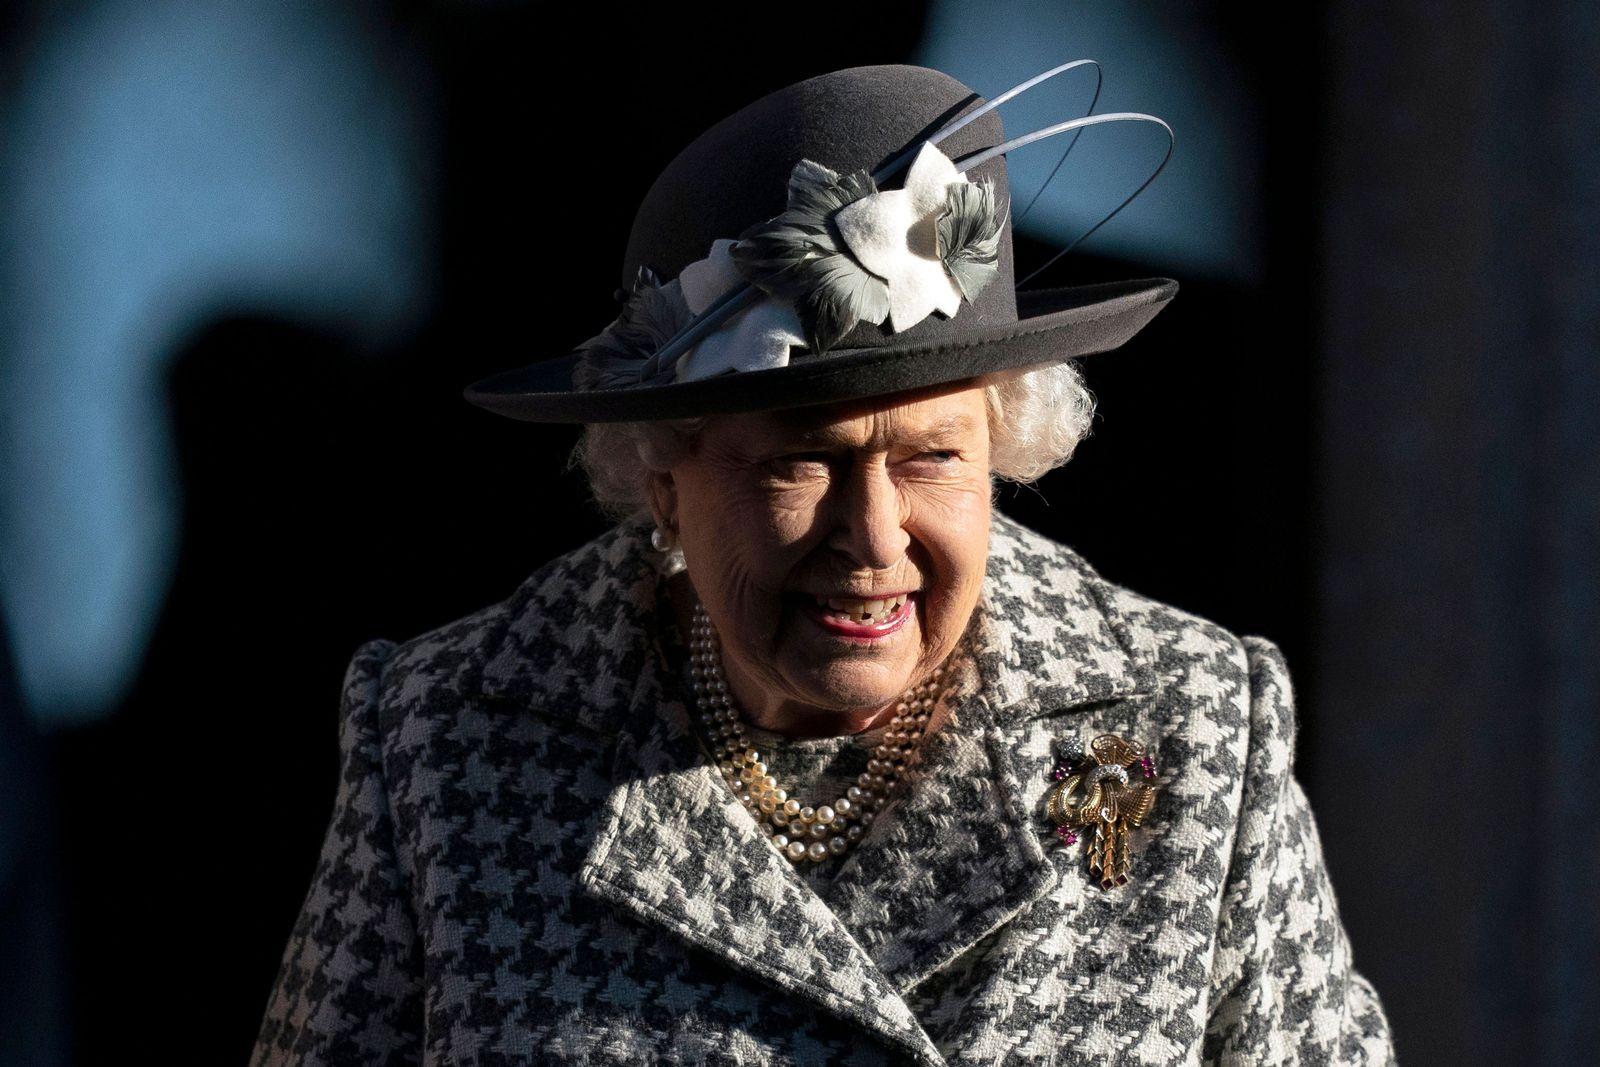 Queen Elizabeth arrives for church service, Hillington, United Kingdom - 19 Jan 2020